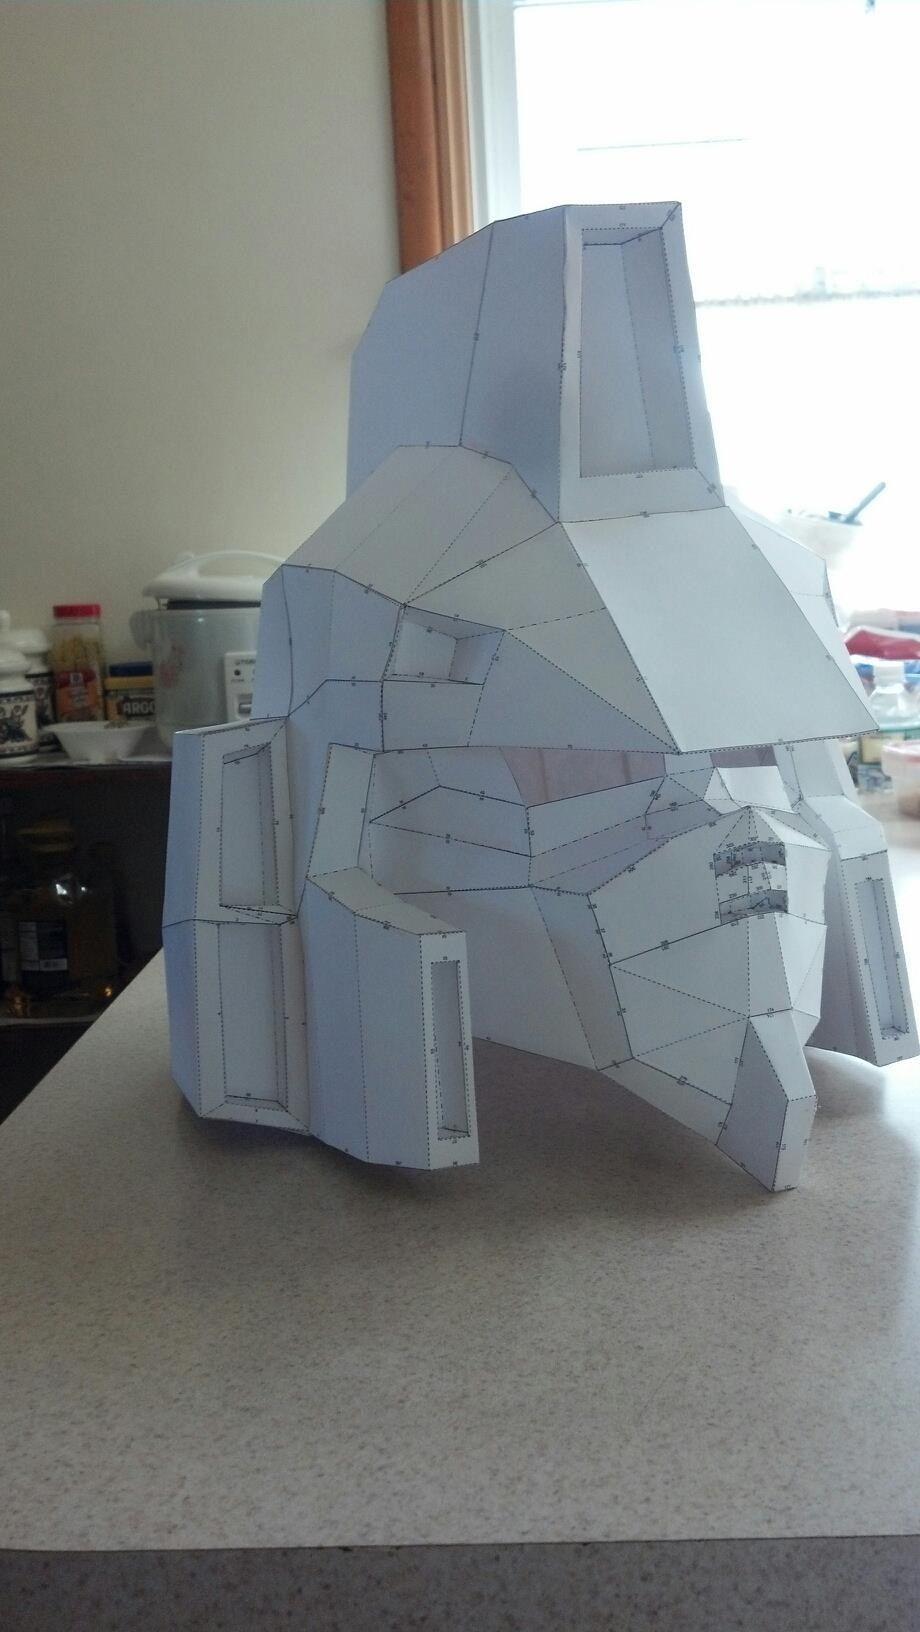 Gundam pepakura head Resources, Tools, and Materials for